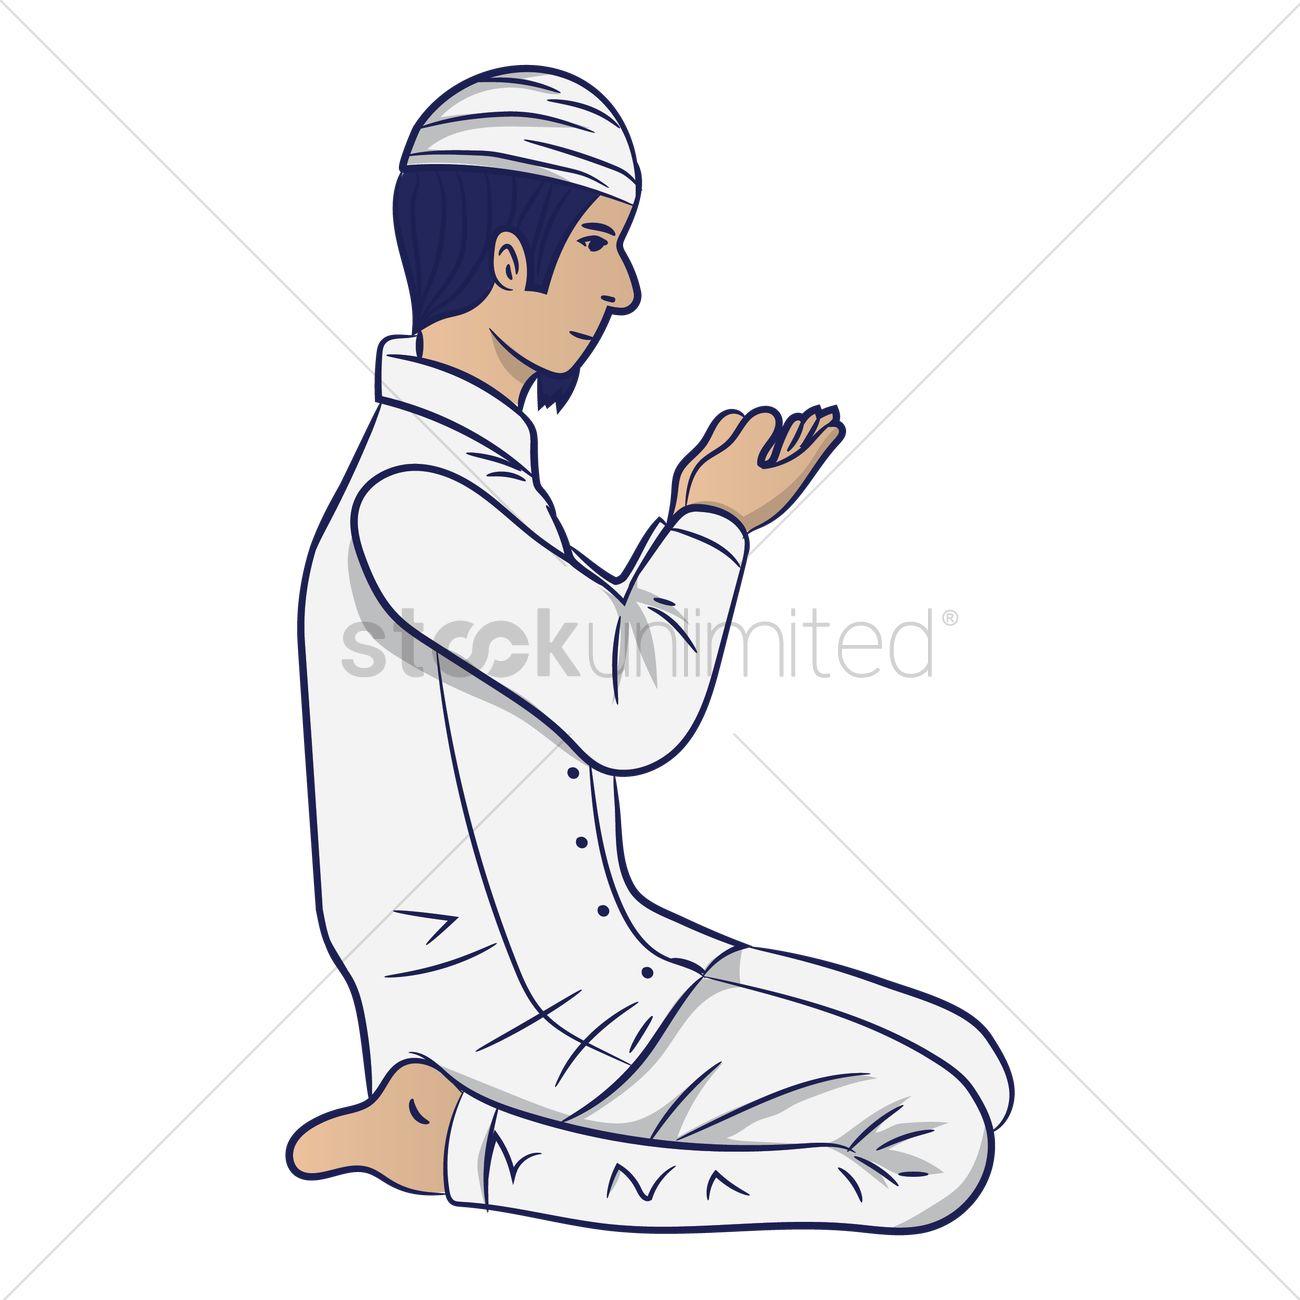 muslim man praying vector image 1996569 stockunlimited